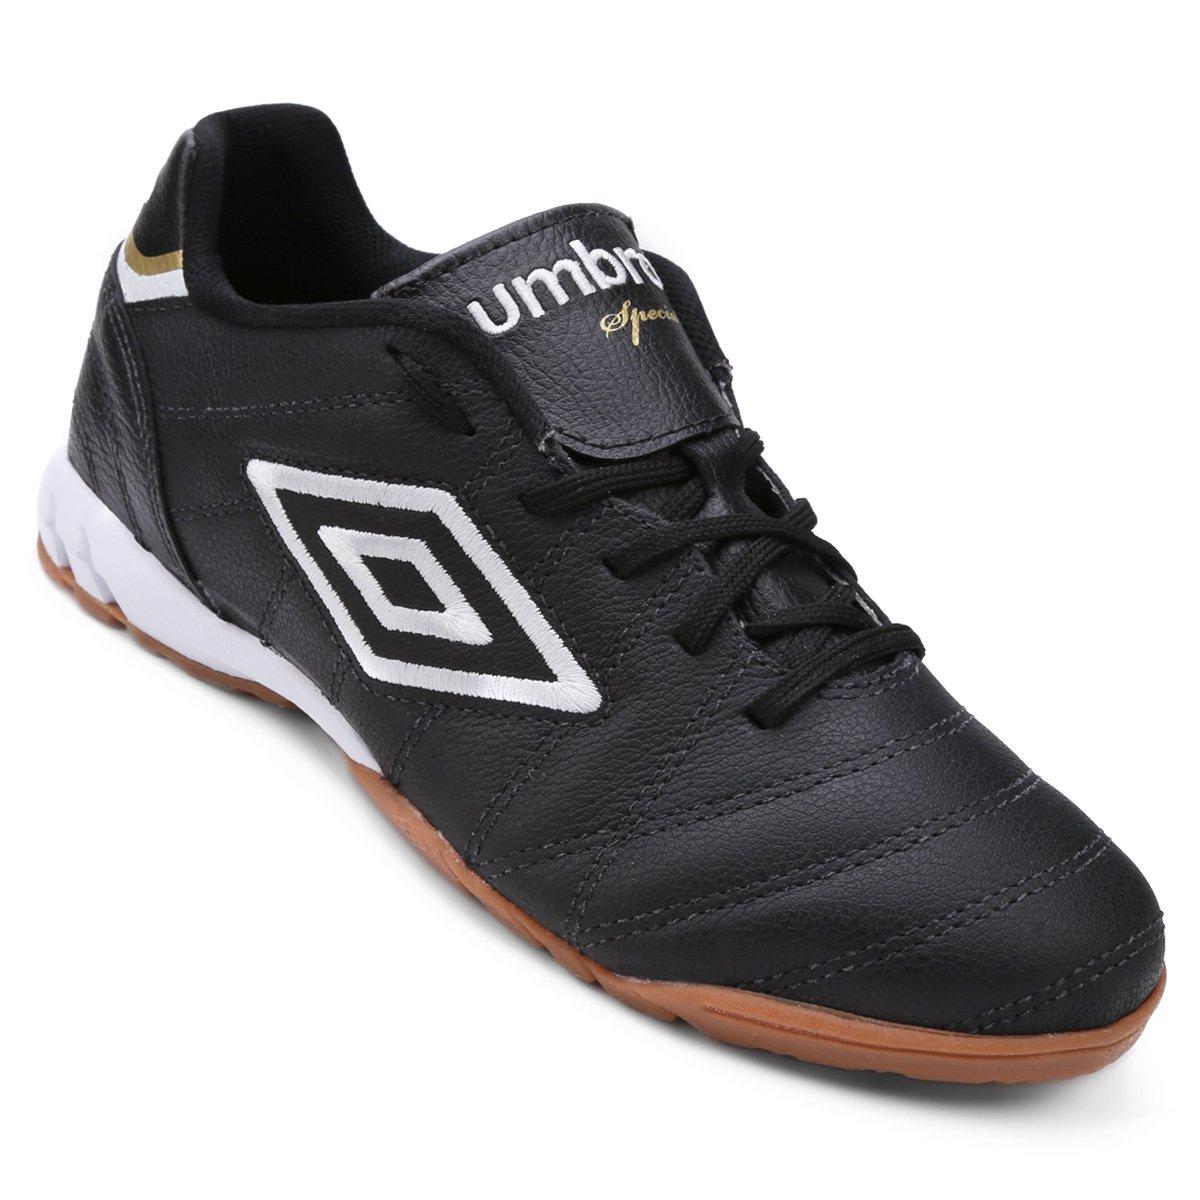 7b887c1fda Chuteira Futsal Umbro Speciali Premier Masculina - Preto e Branco